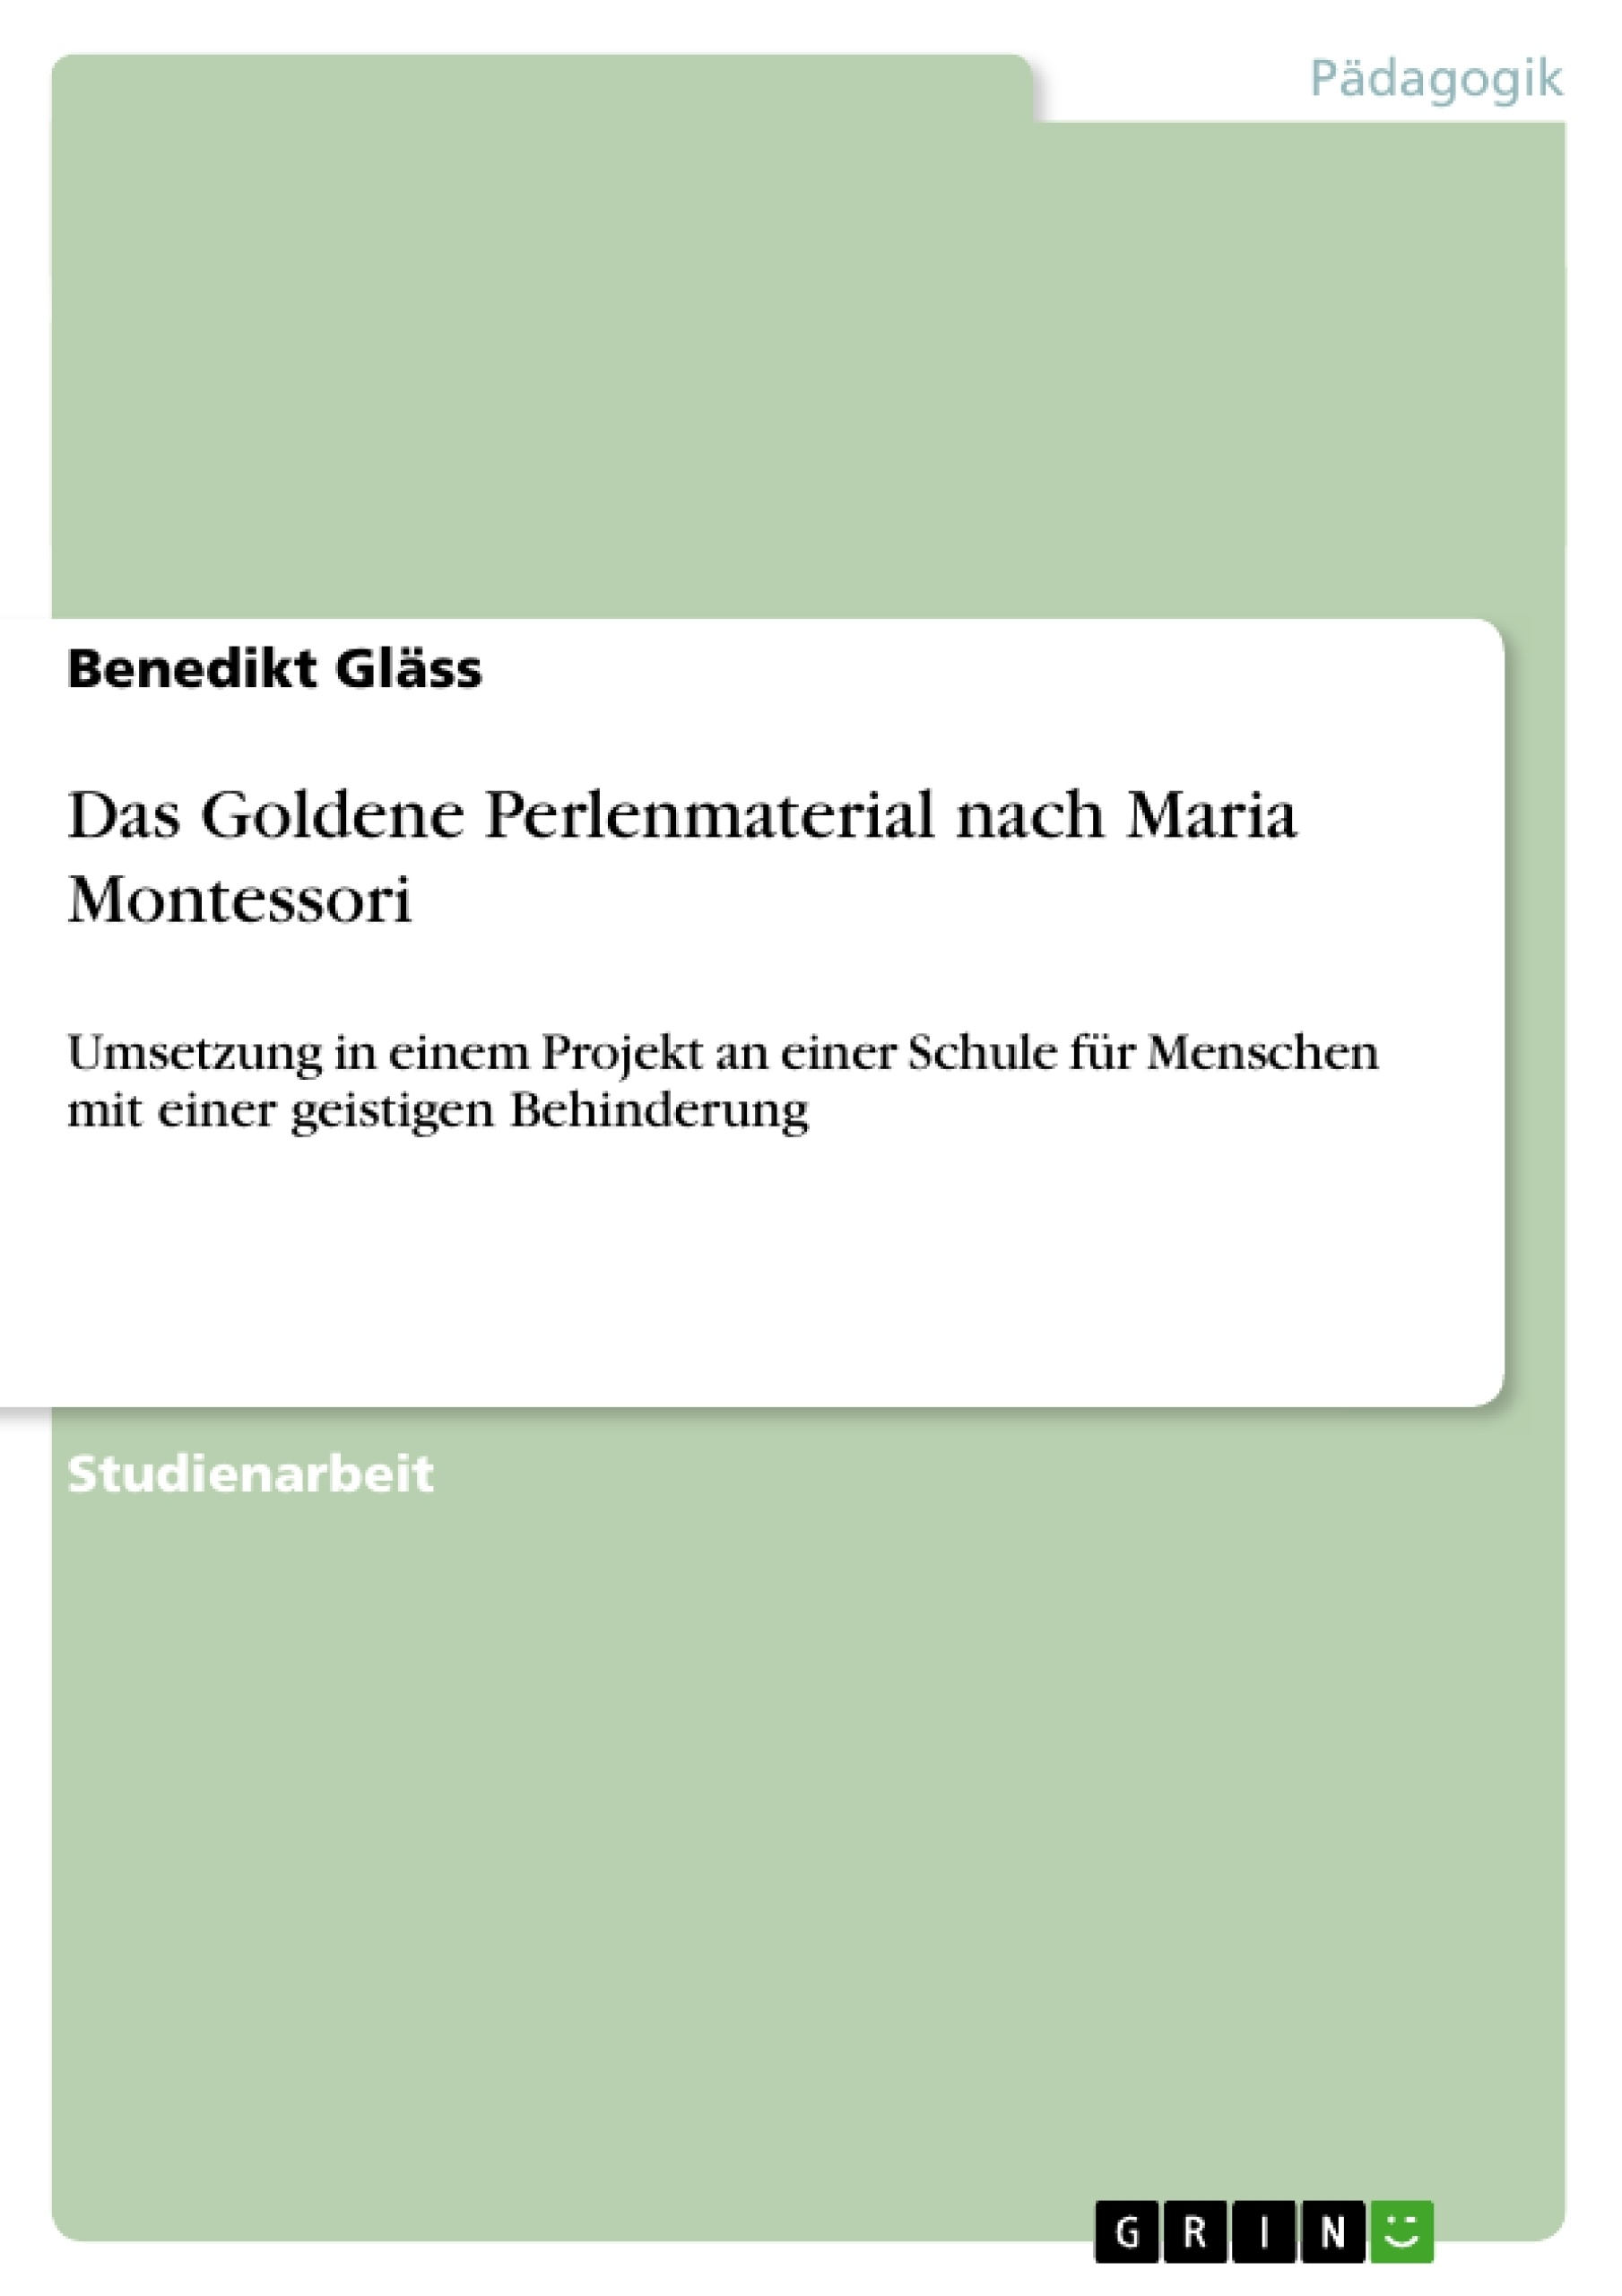 Titel: Das Goldene Perlenmaterial nach Maria Montessori